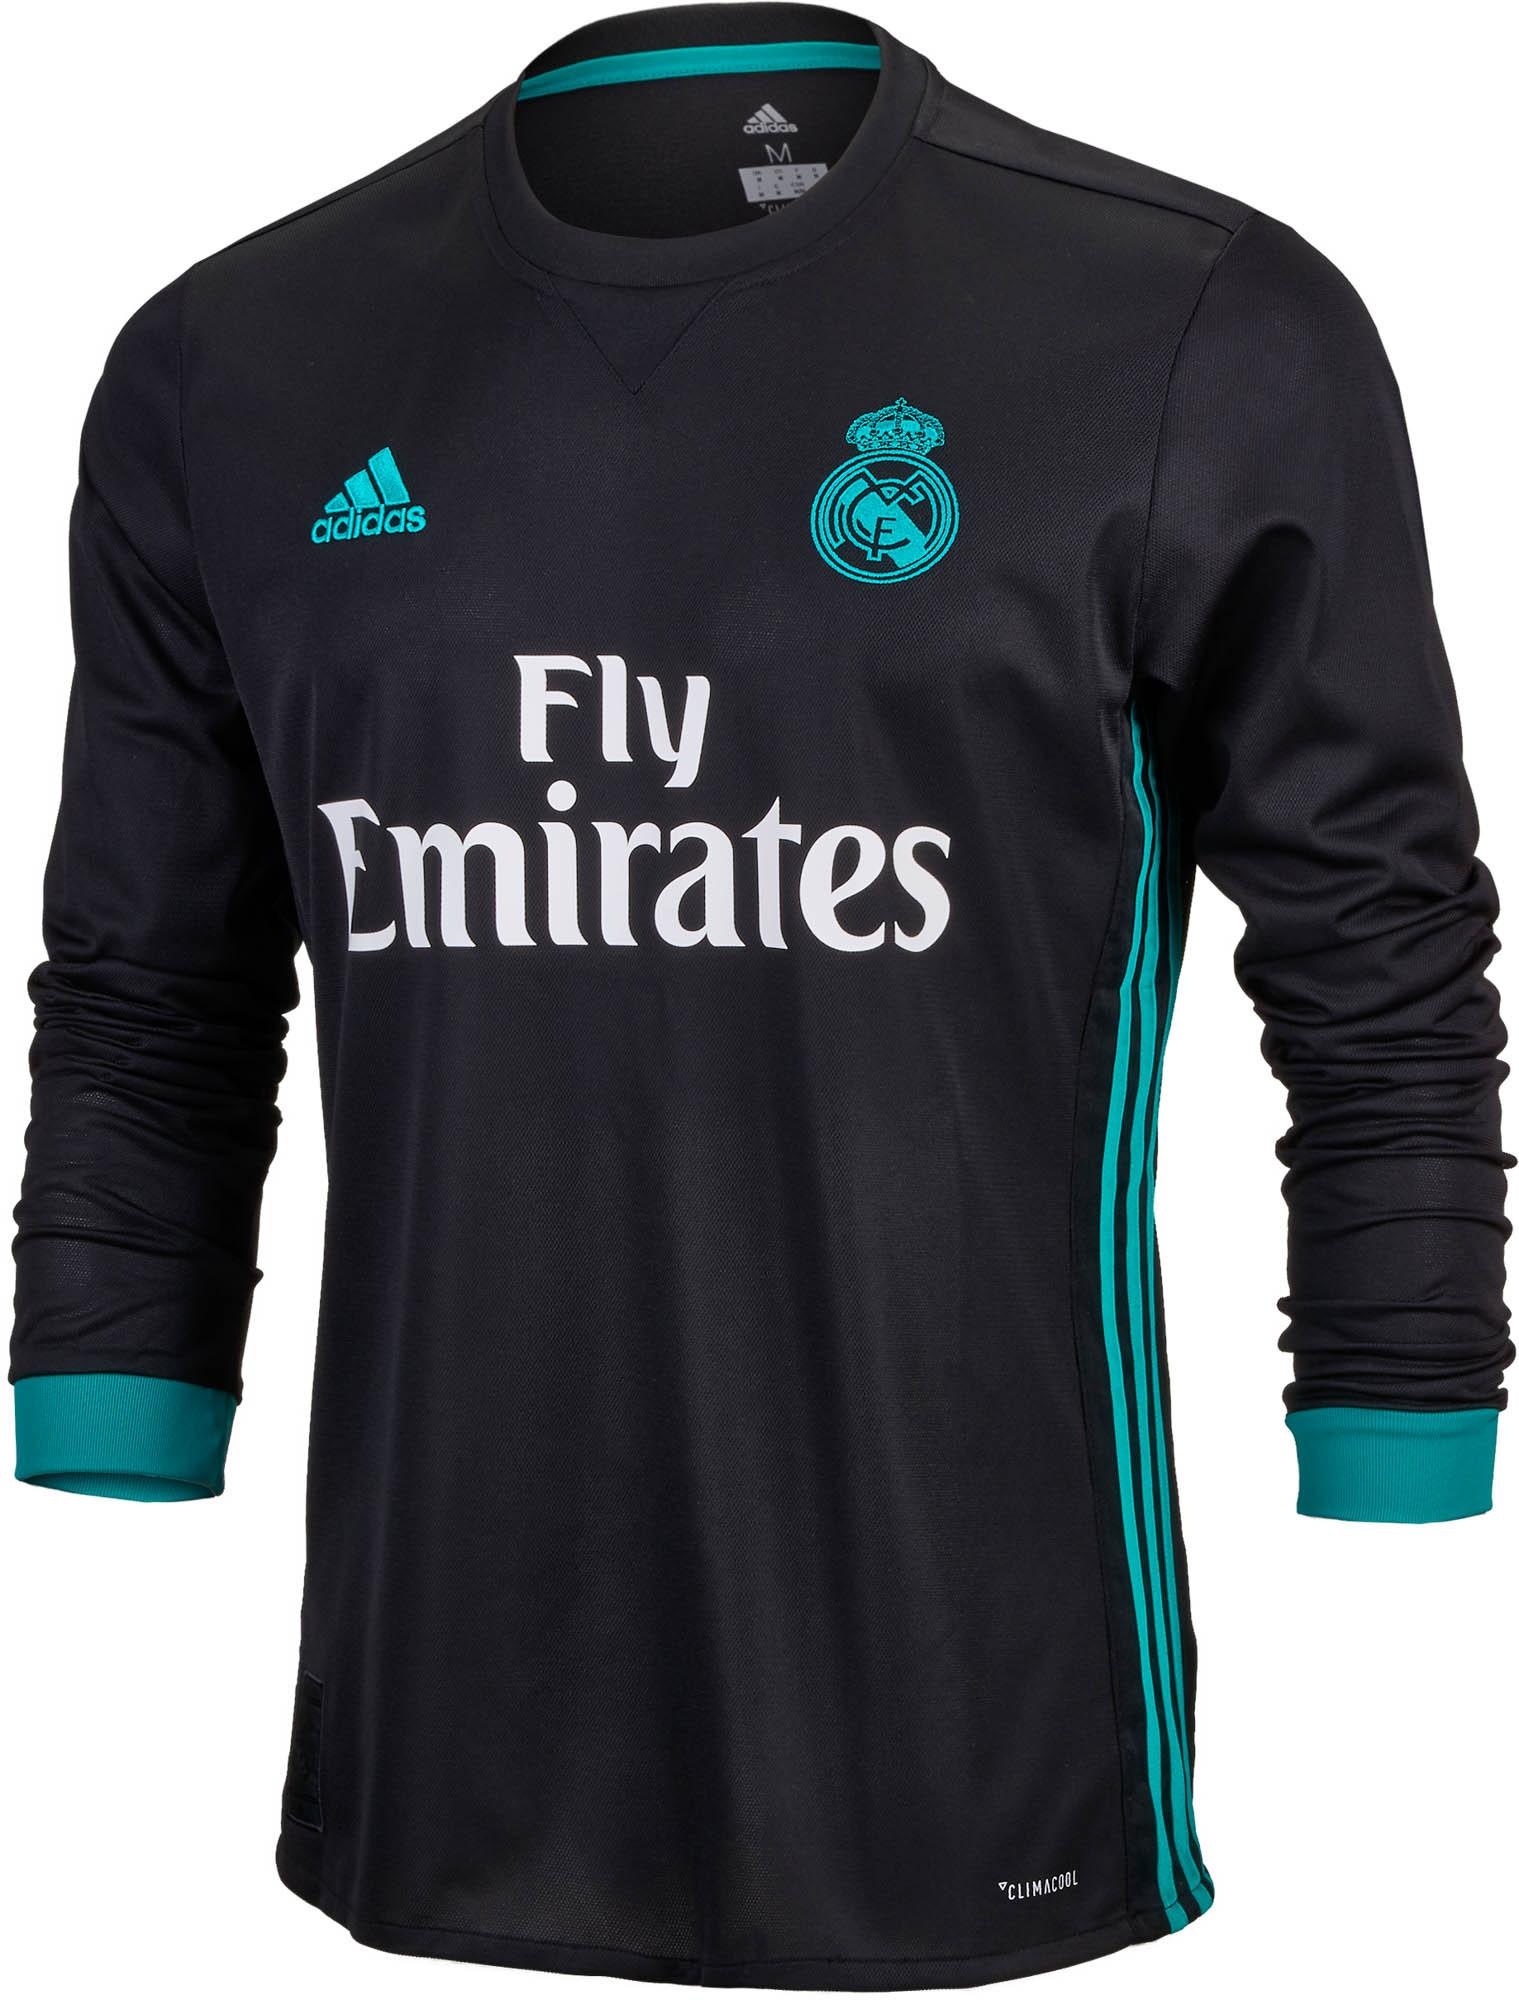 more photos 2dd75 ed6b7 Real Madrid Away Jersey s 2017-18 L Adidas designation ...